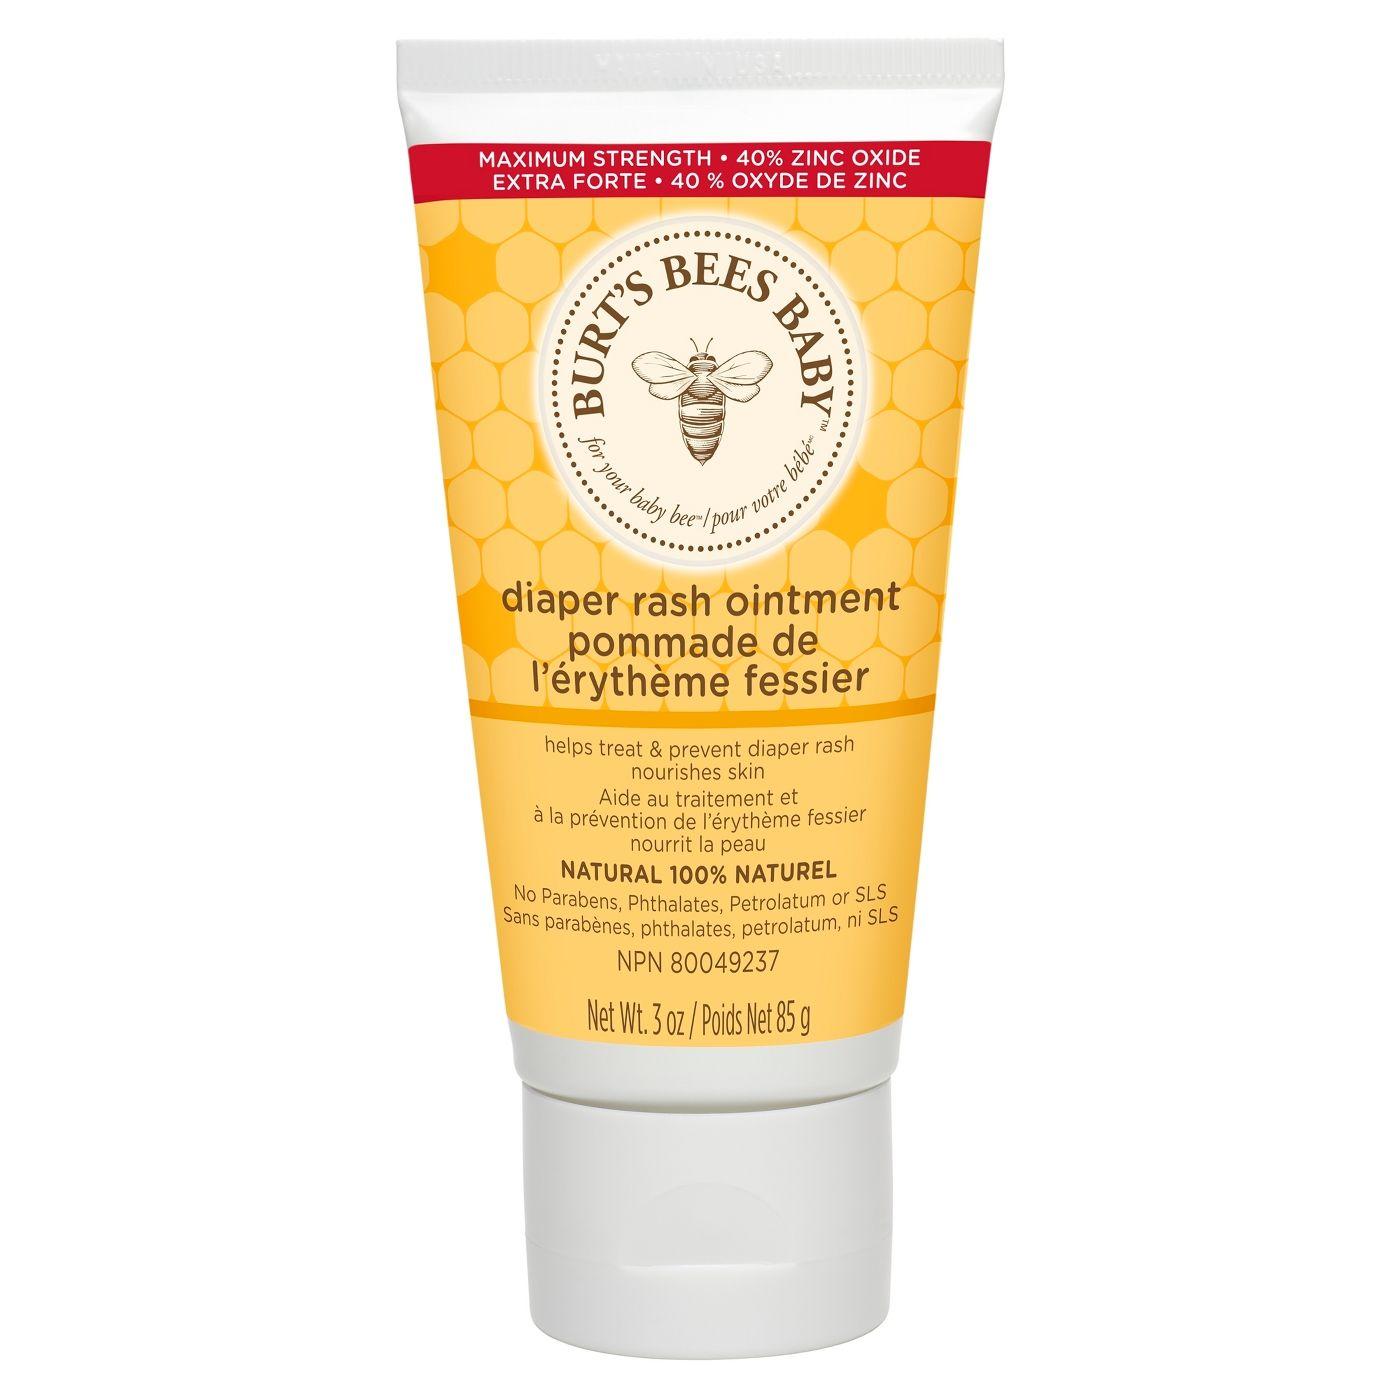 Burt's Bees Baby Bee 100% Natural Diaper Rash Ointment 85g